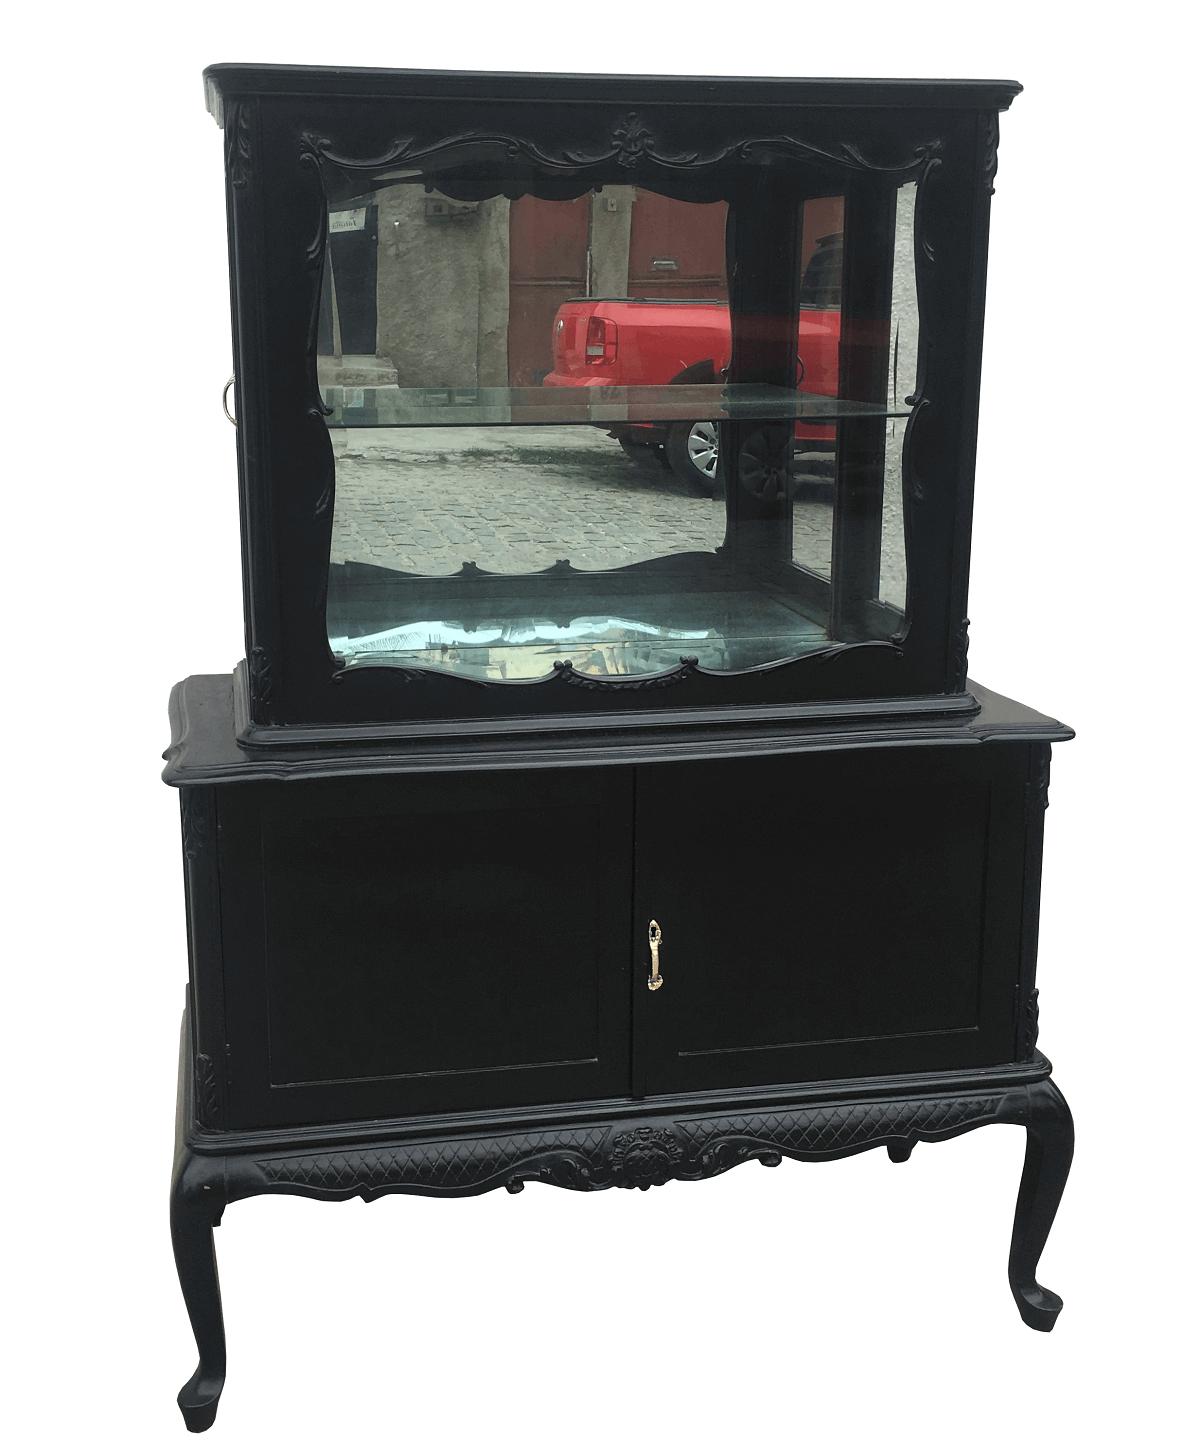 Antiga Cristaleira Luis Xv Preta Vidros Bisotados